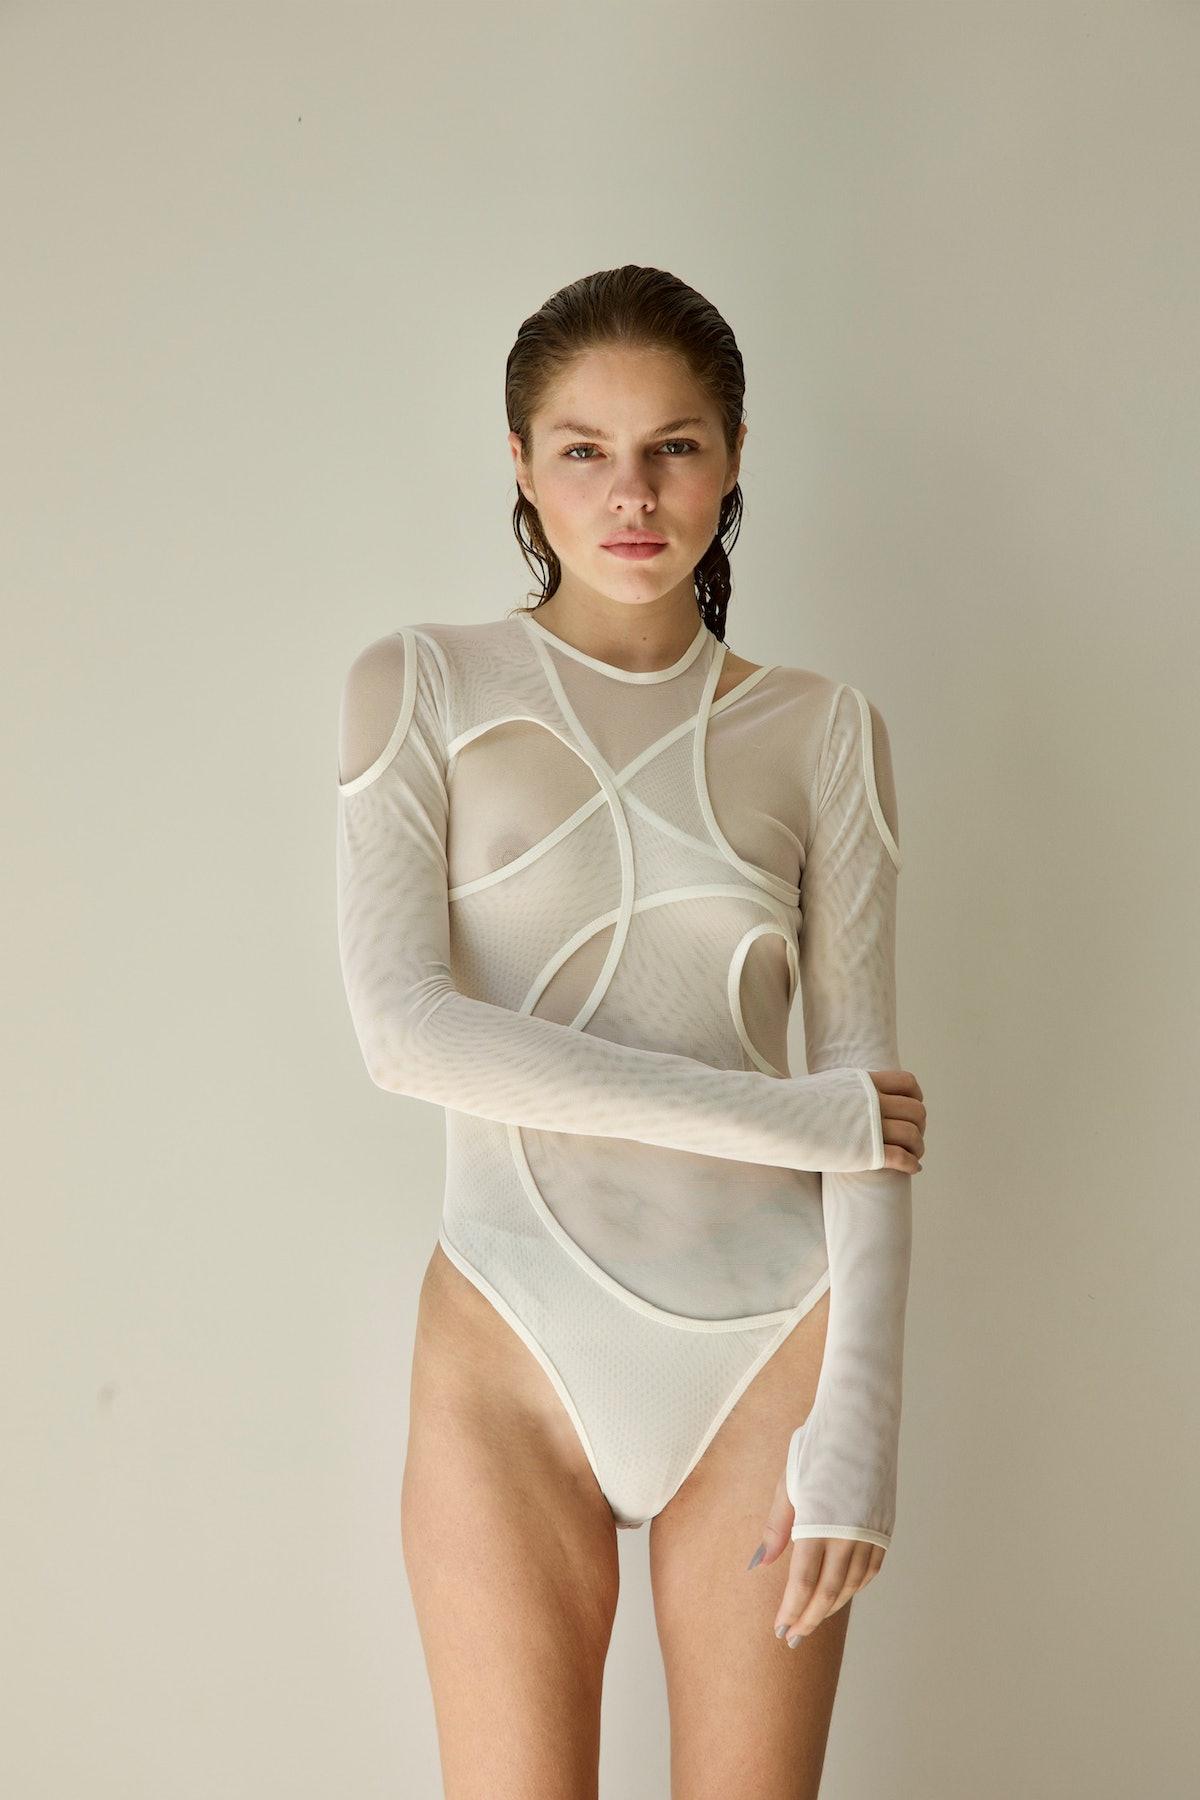 Model wears Clarissa Larrazabal's bodysuit.